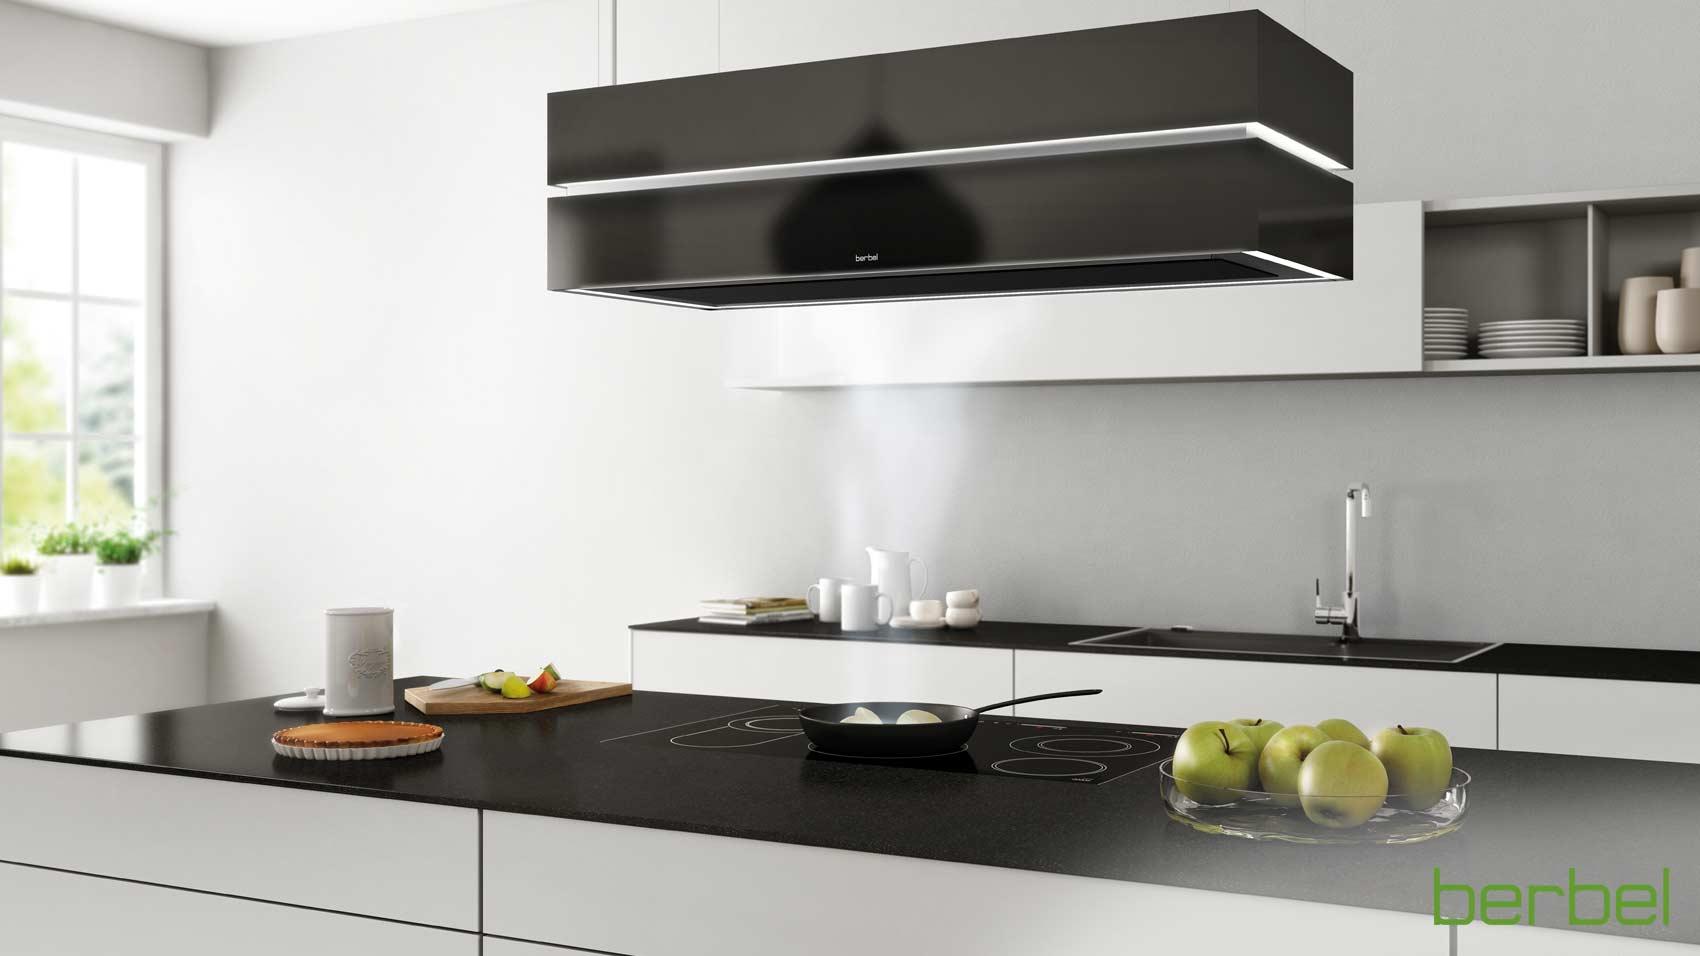 Möbel Jena berbel dunstabzugsysteme nahe erfurt jena weimar möbel u küchen